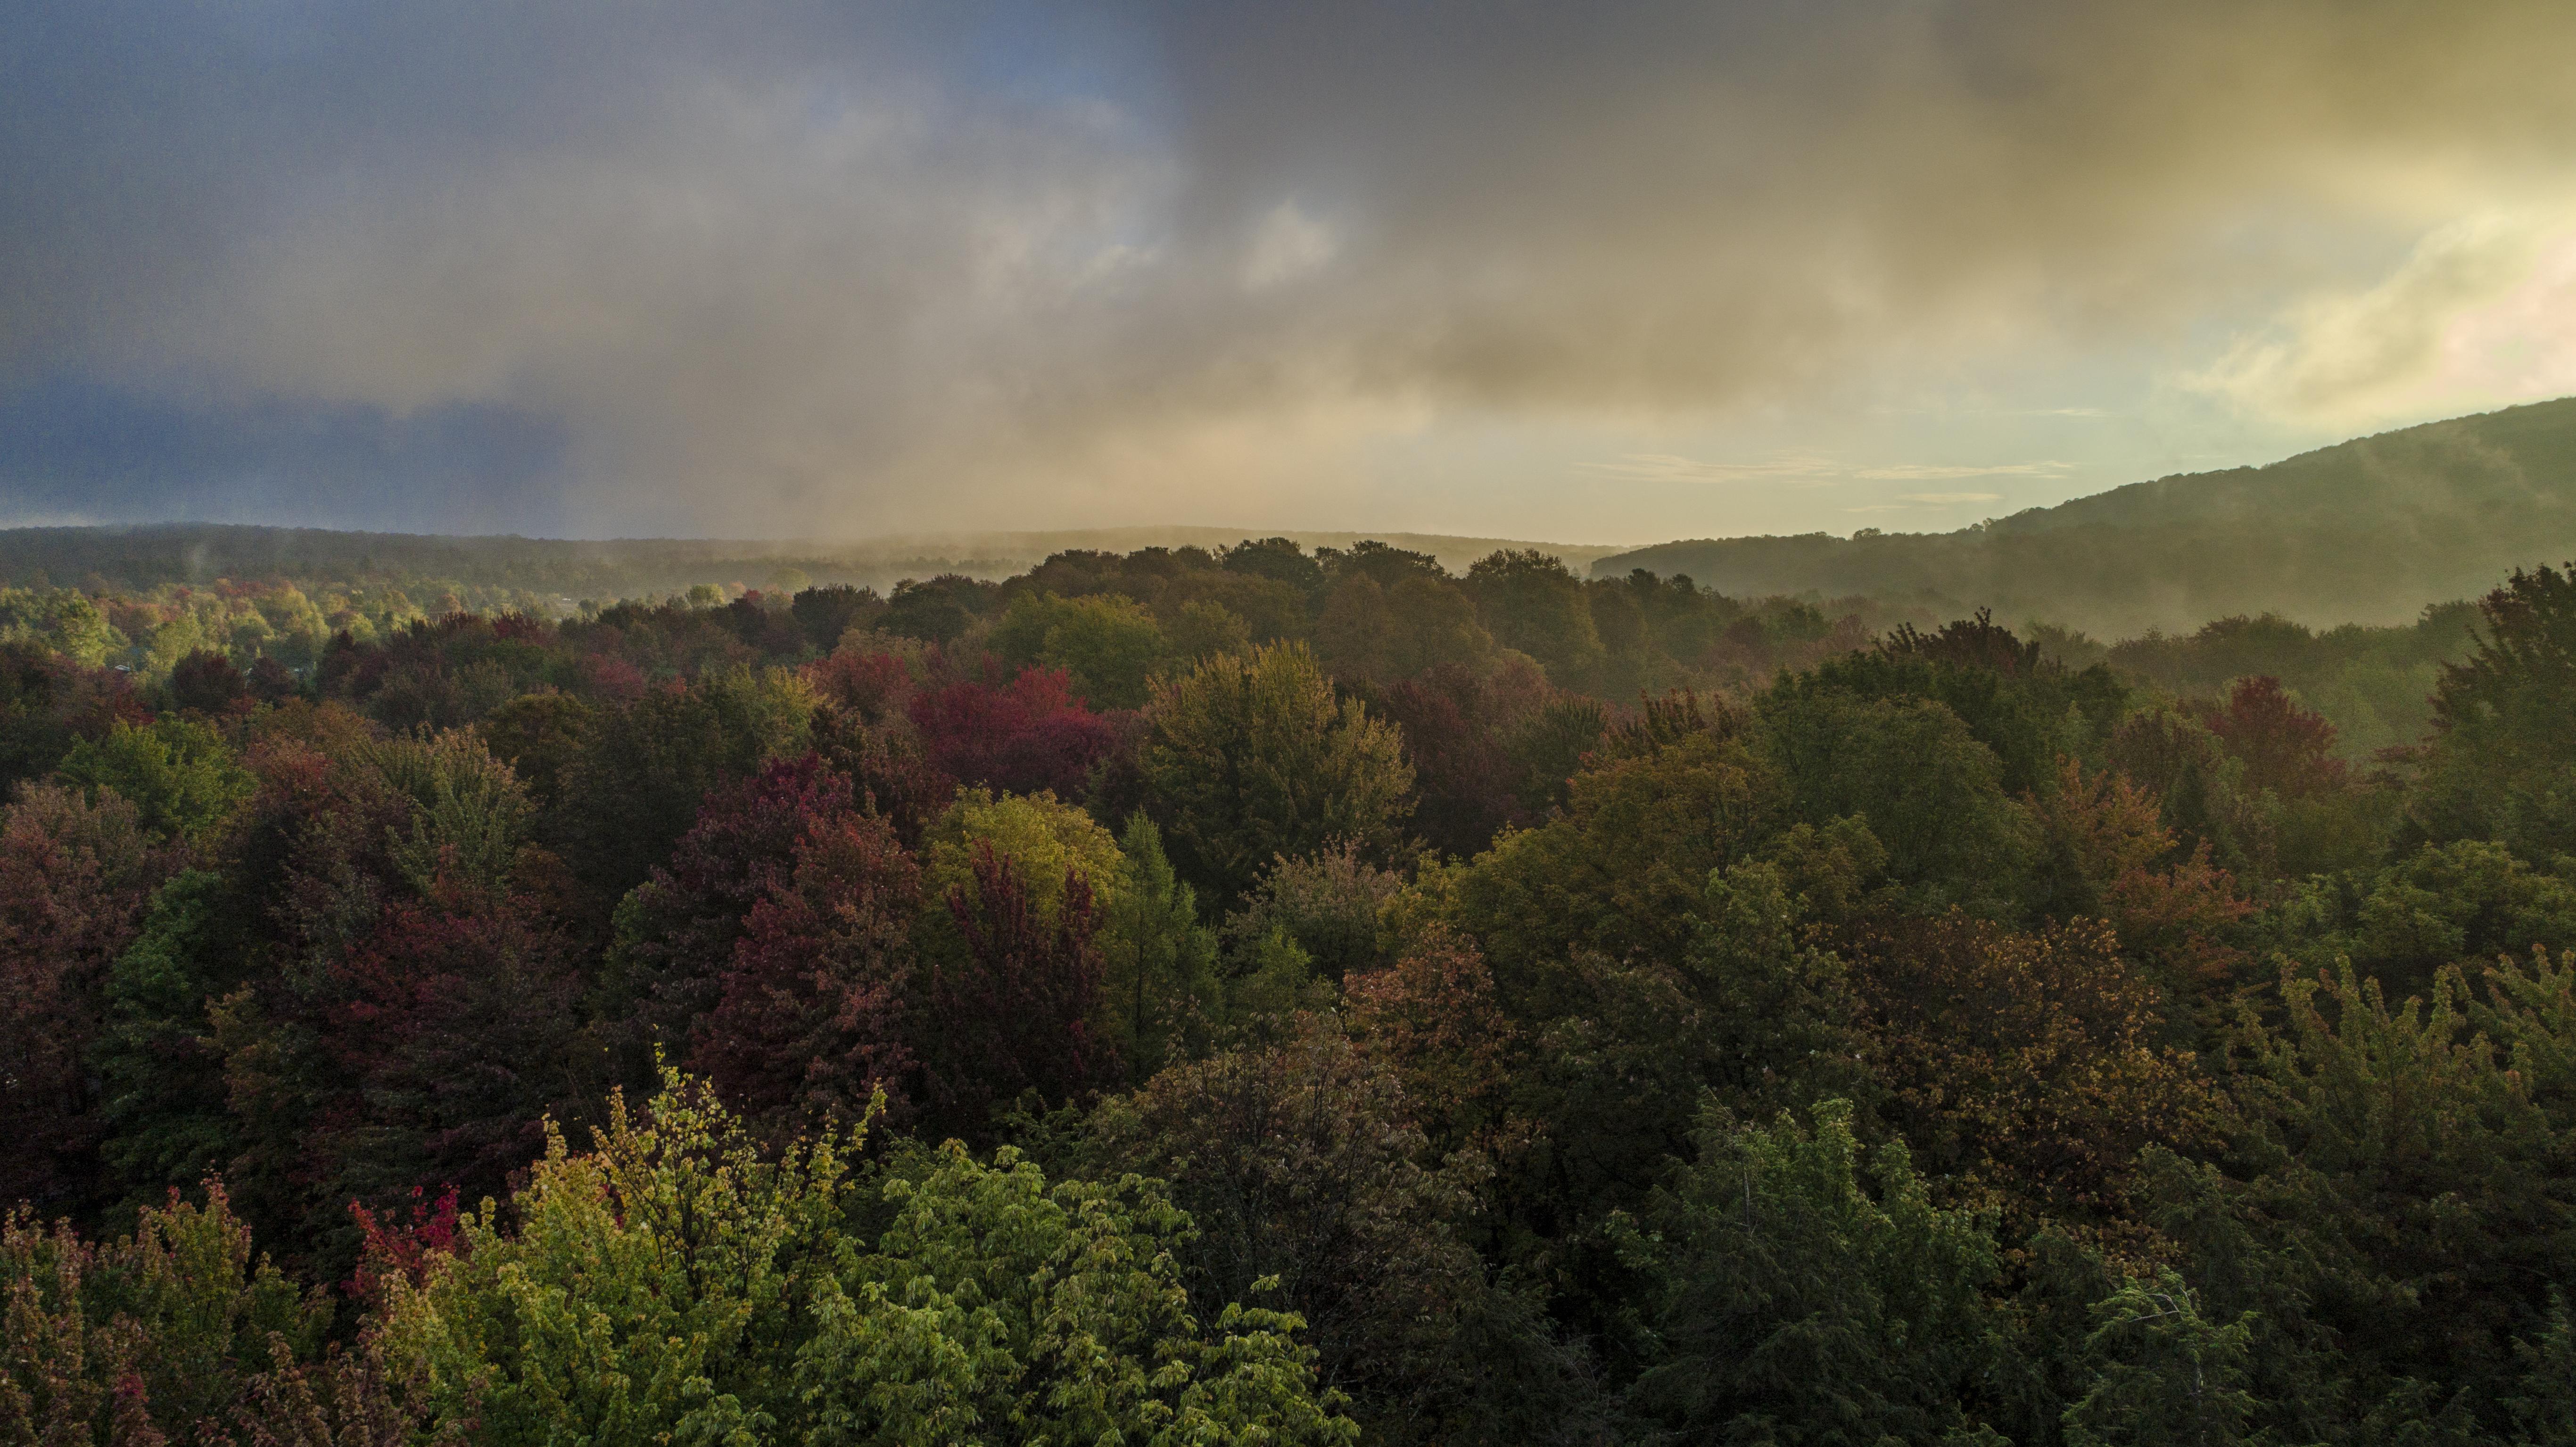 Brouillard Automne drone Dji Phantom